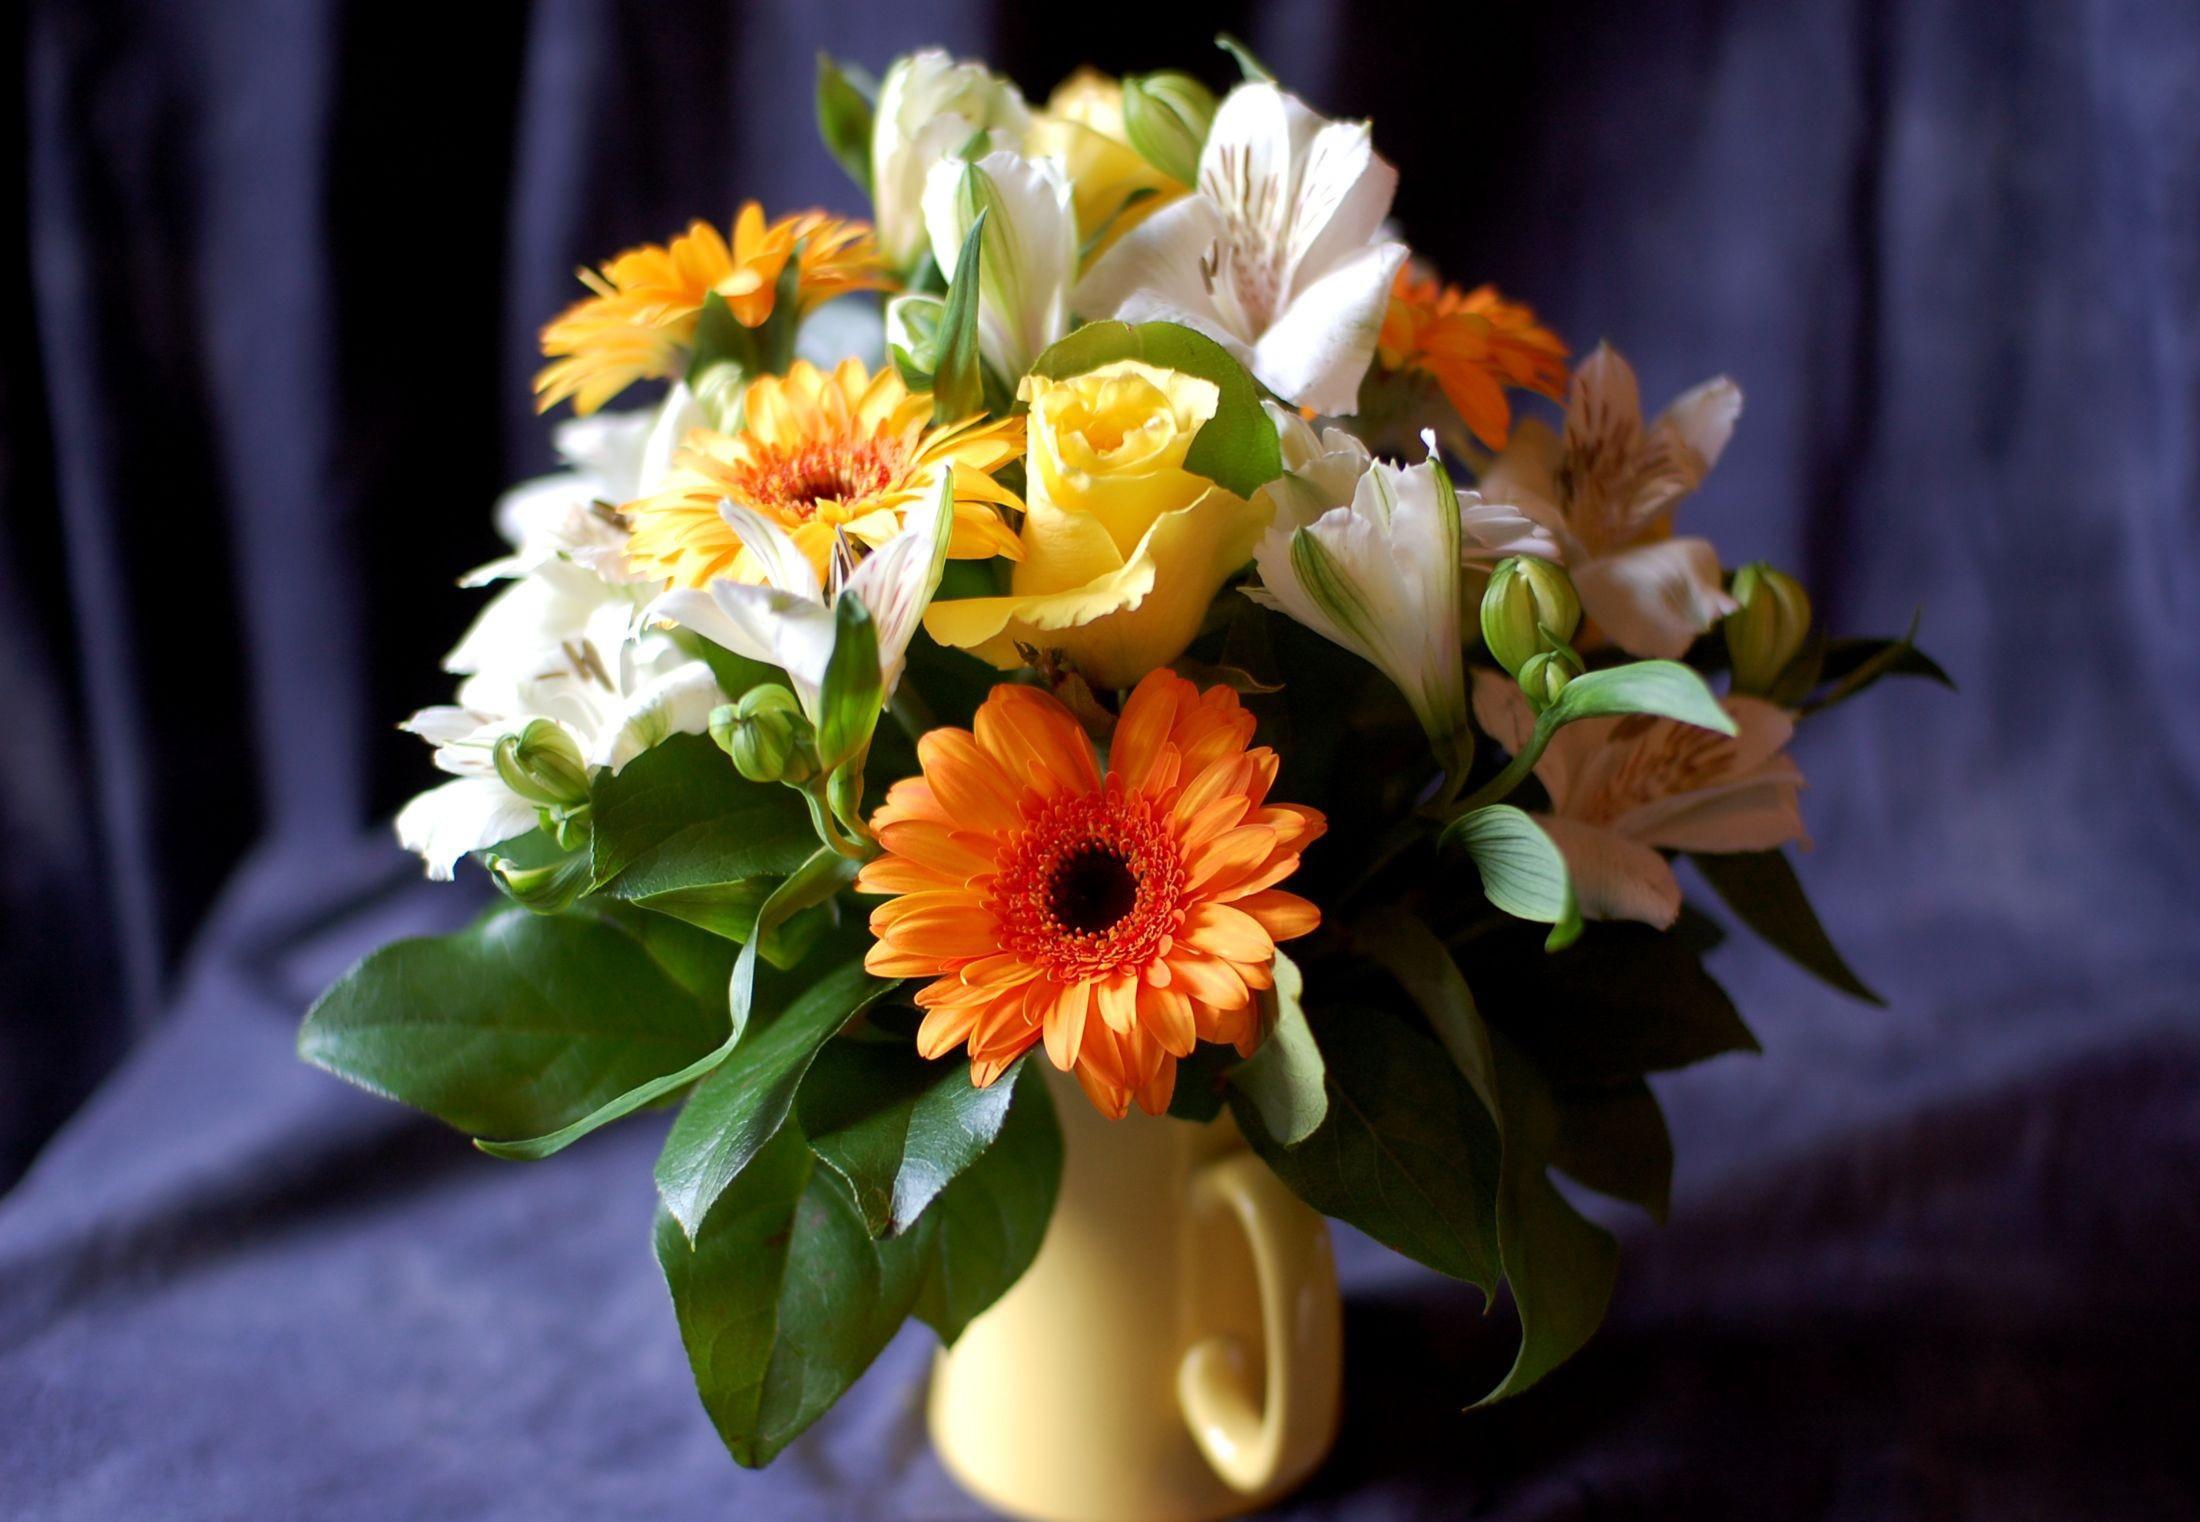 Букеты цветов фото и обои